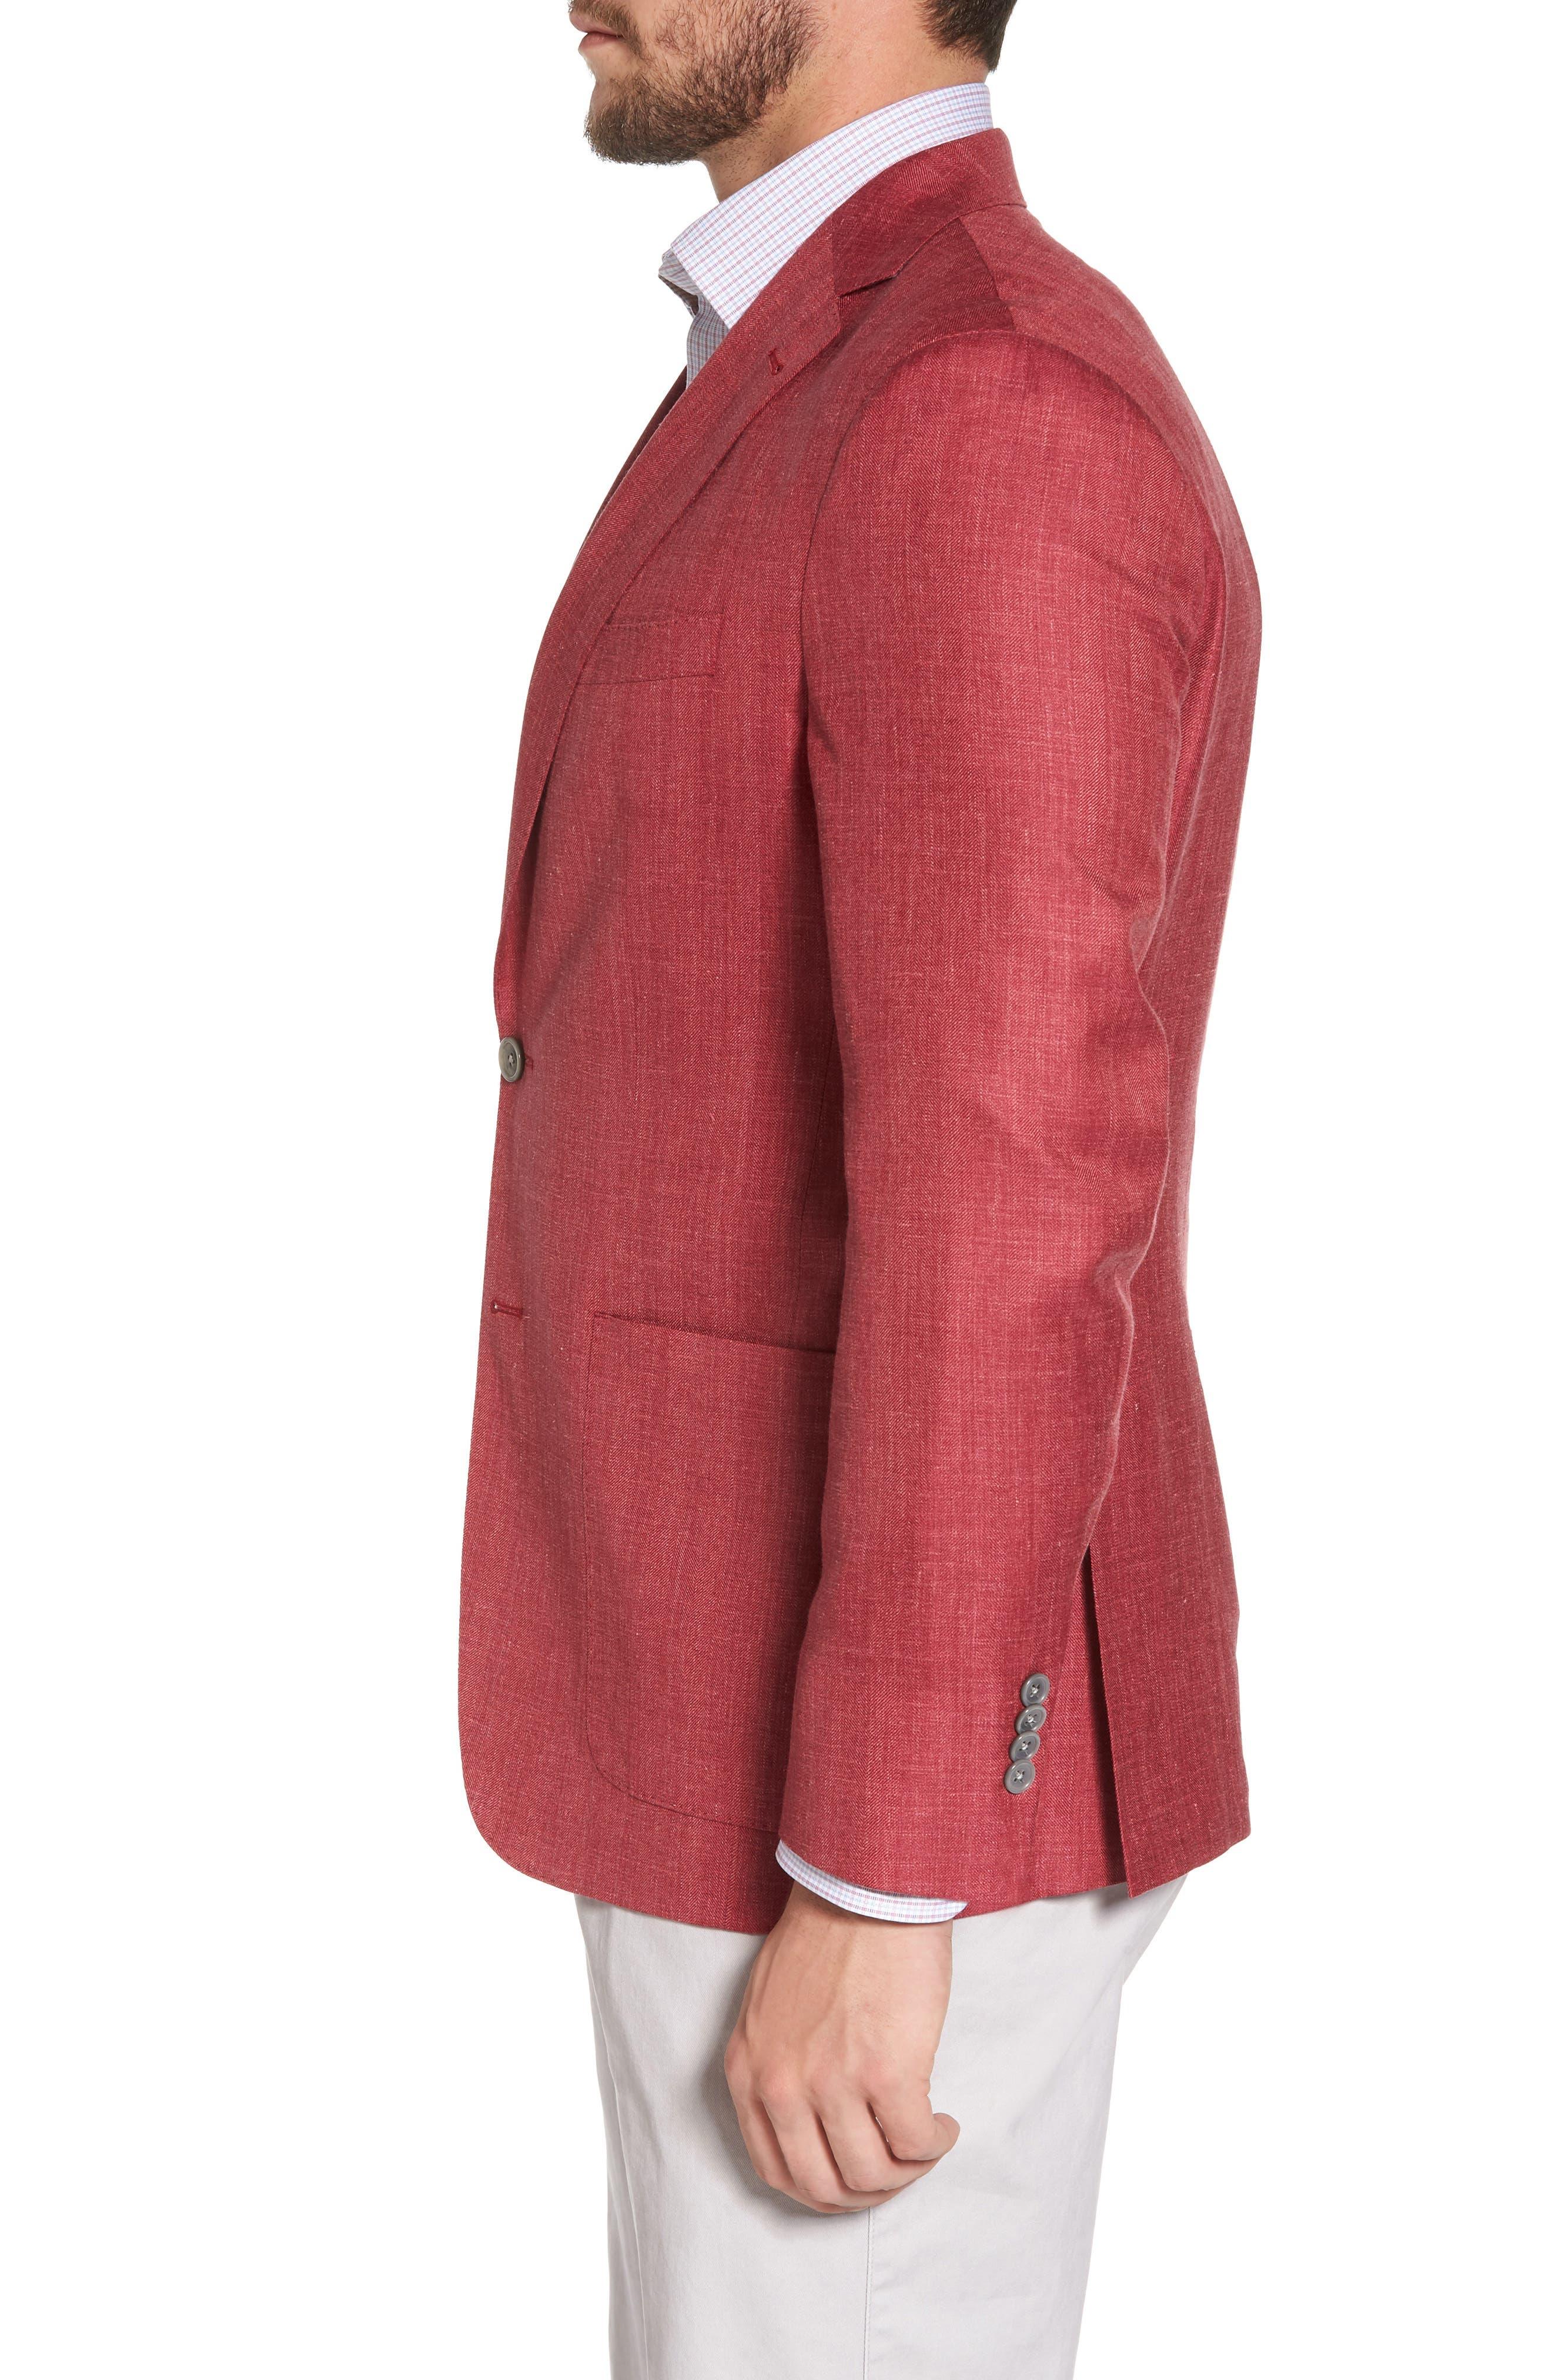 Aiden Classic Fit Wool Blend Blazer,                             Alternate thumbnail 3, color,                             600